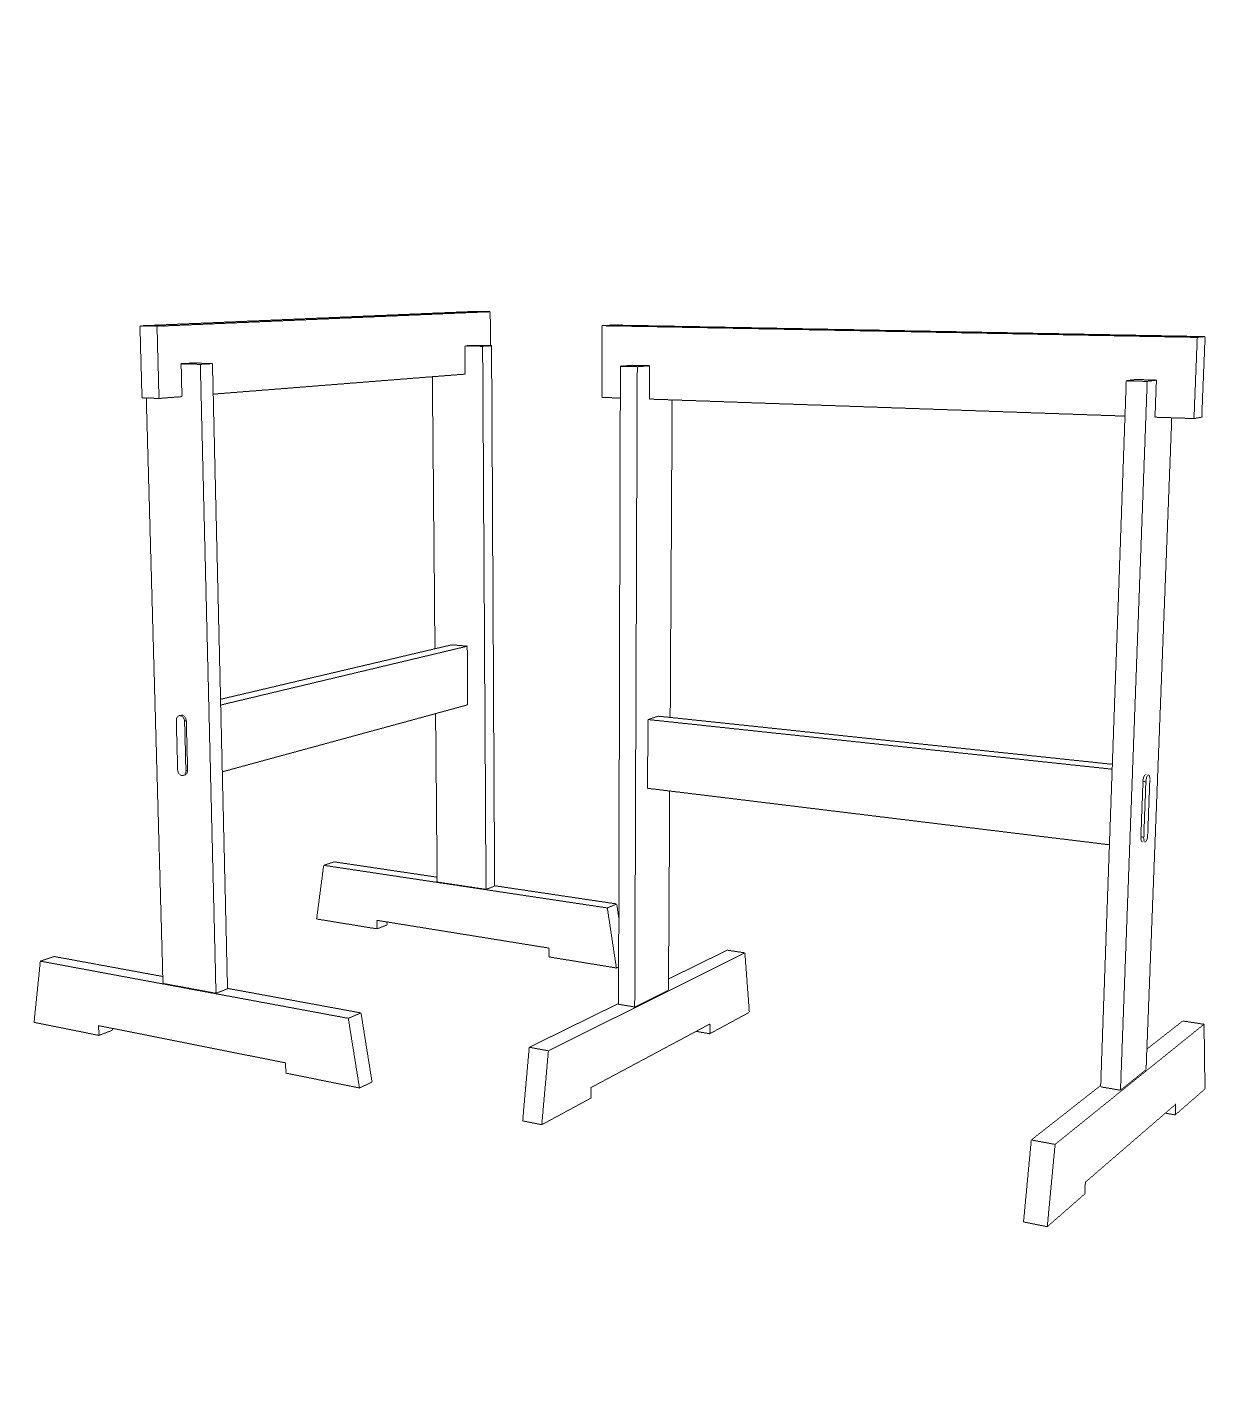 sketchup image of James Krenov Style Sawhorse Project Plans